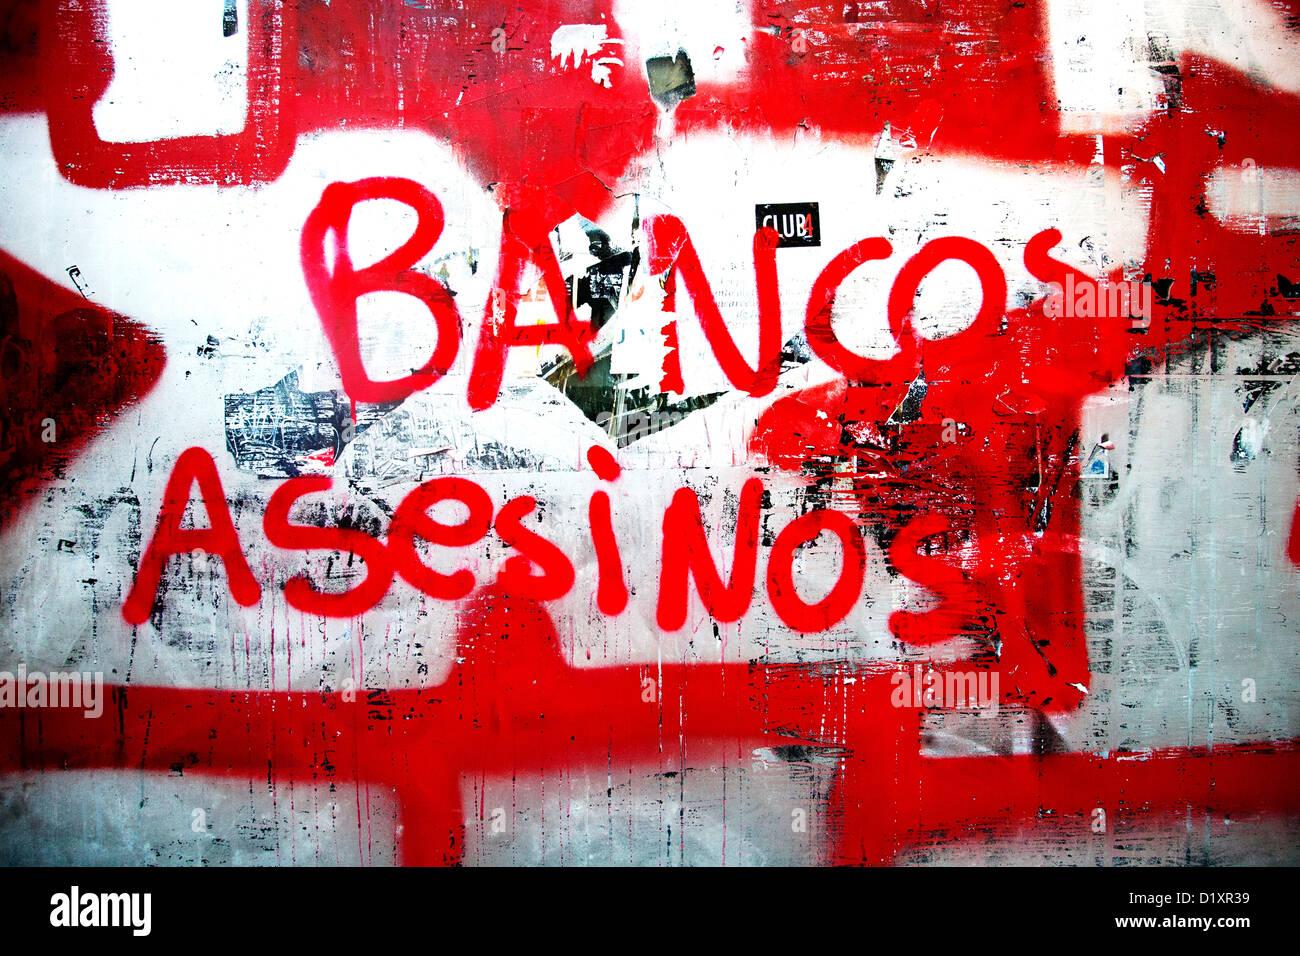 Anti capitalist graffiti, Barcelona, Spain - Stock Image